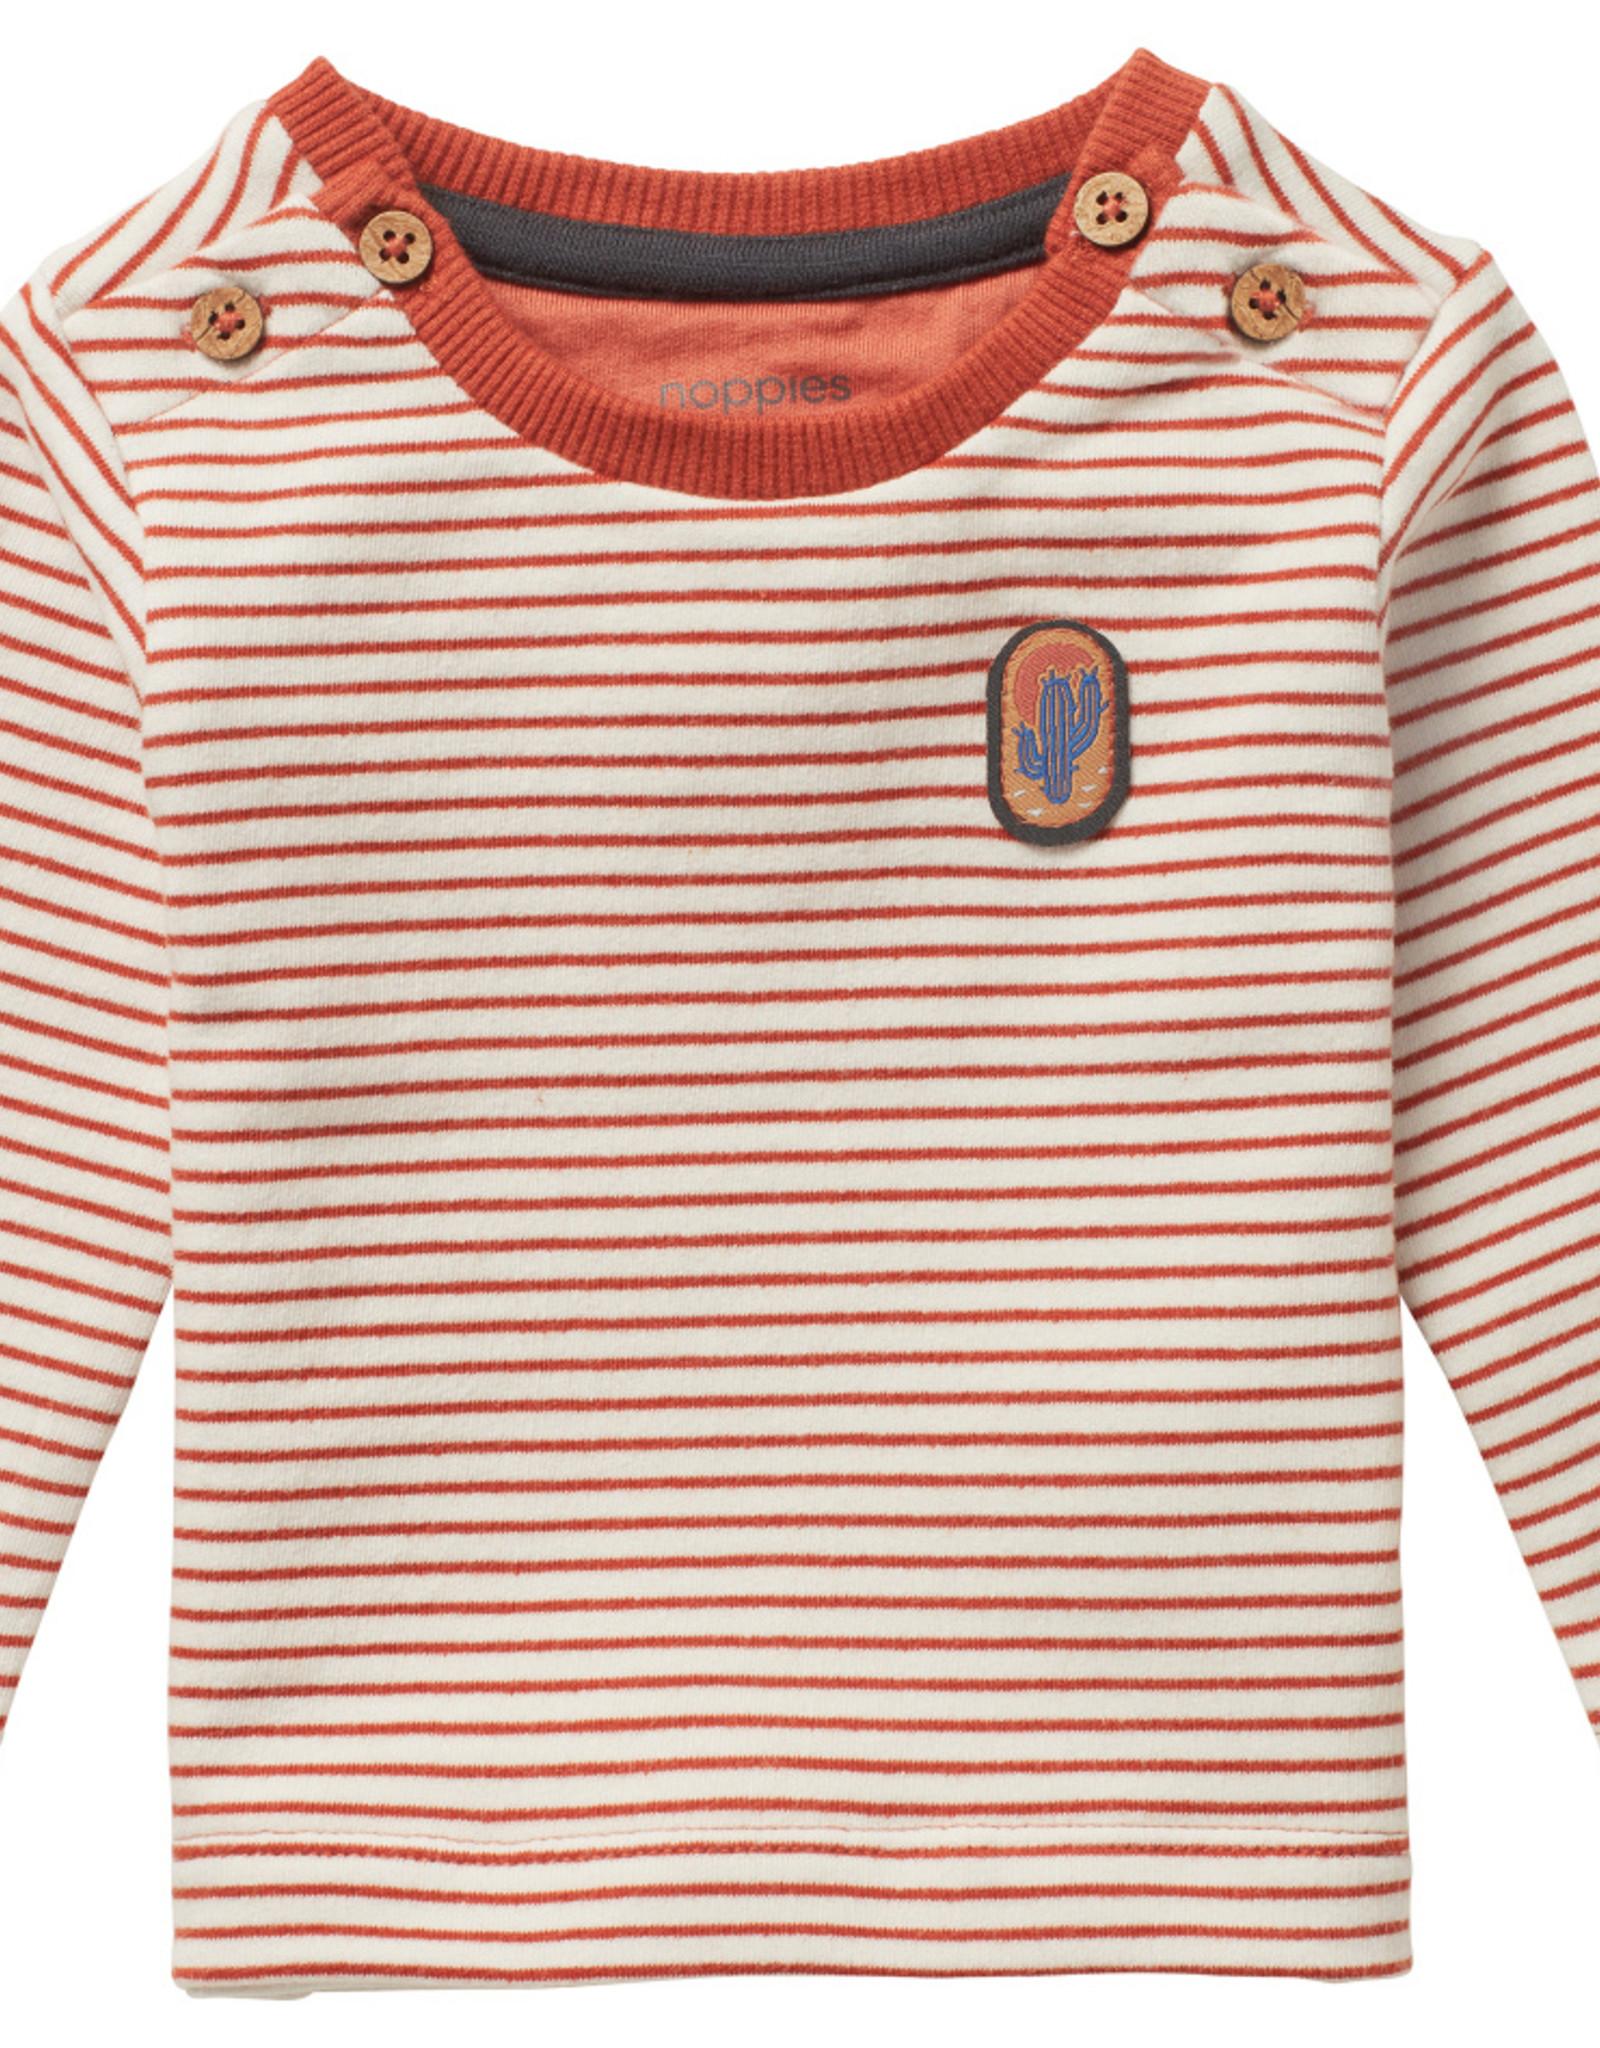 Noppies SP21 Bby B Sand Stripe T-shirt